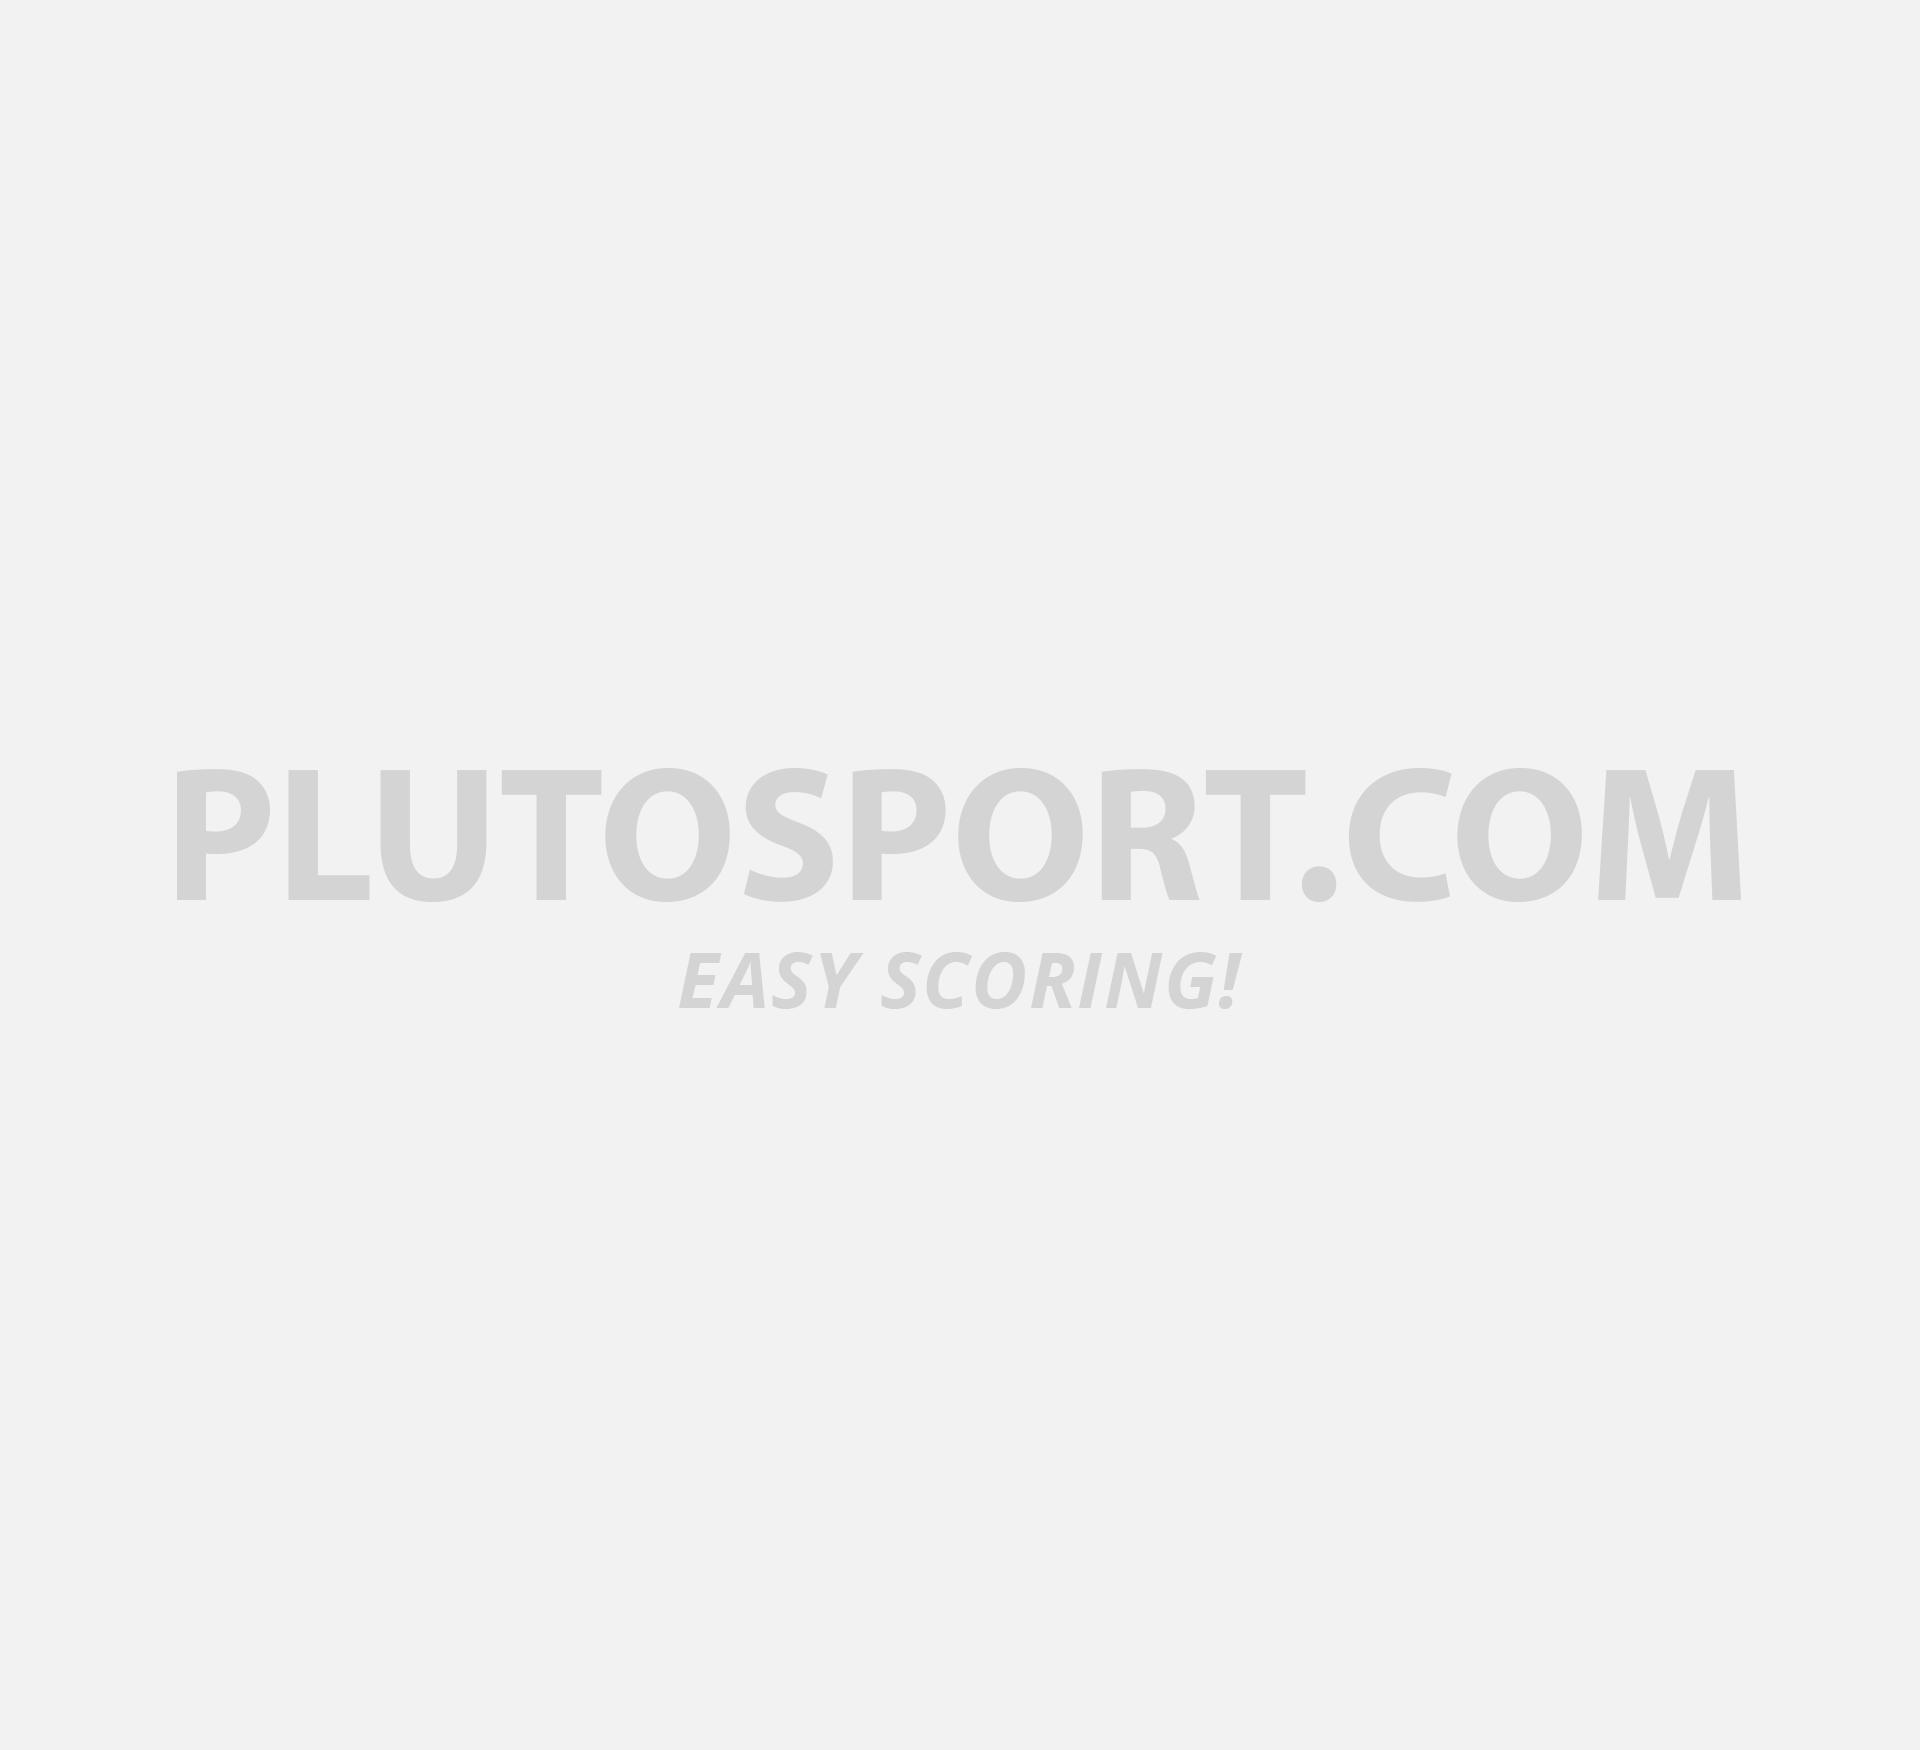 5e25b59ae0e7 Fila Tricolore Tracksuit Men - Tracksuits - Clothing - Tennis ...